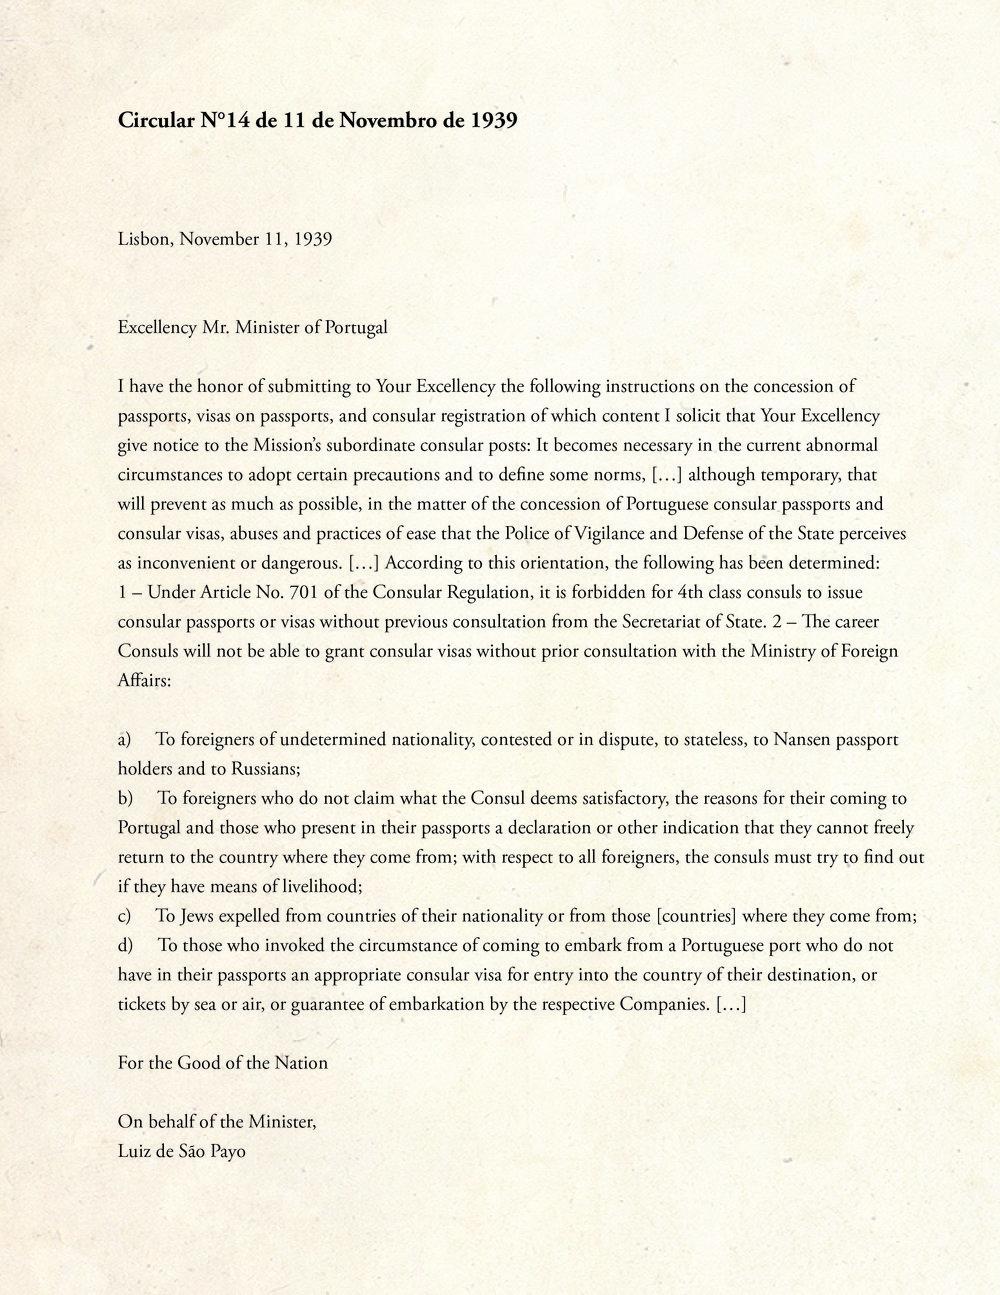 Document 1. Circular 14